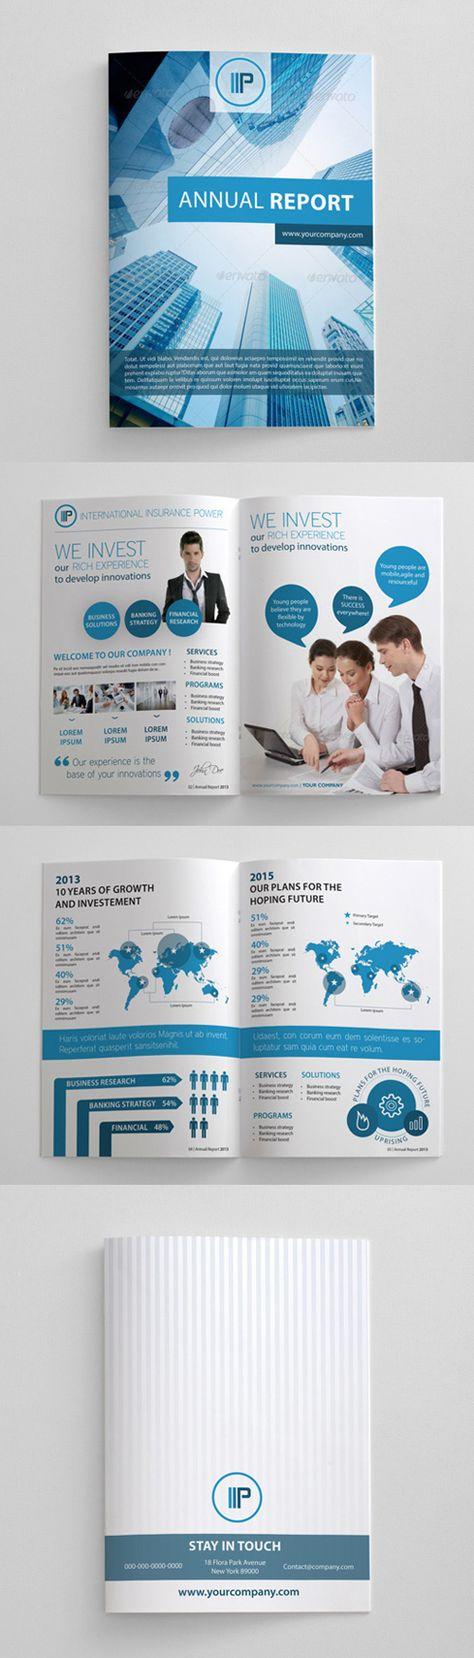 Business Brochure Design Inspiration  Design